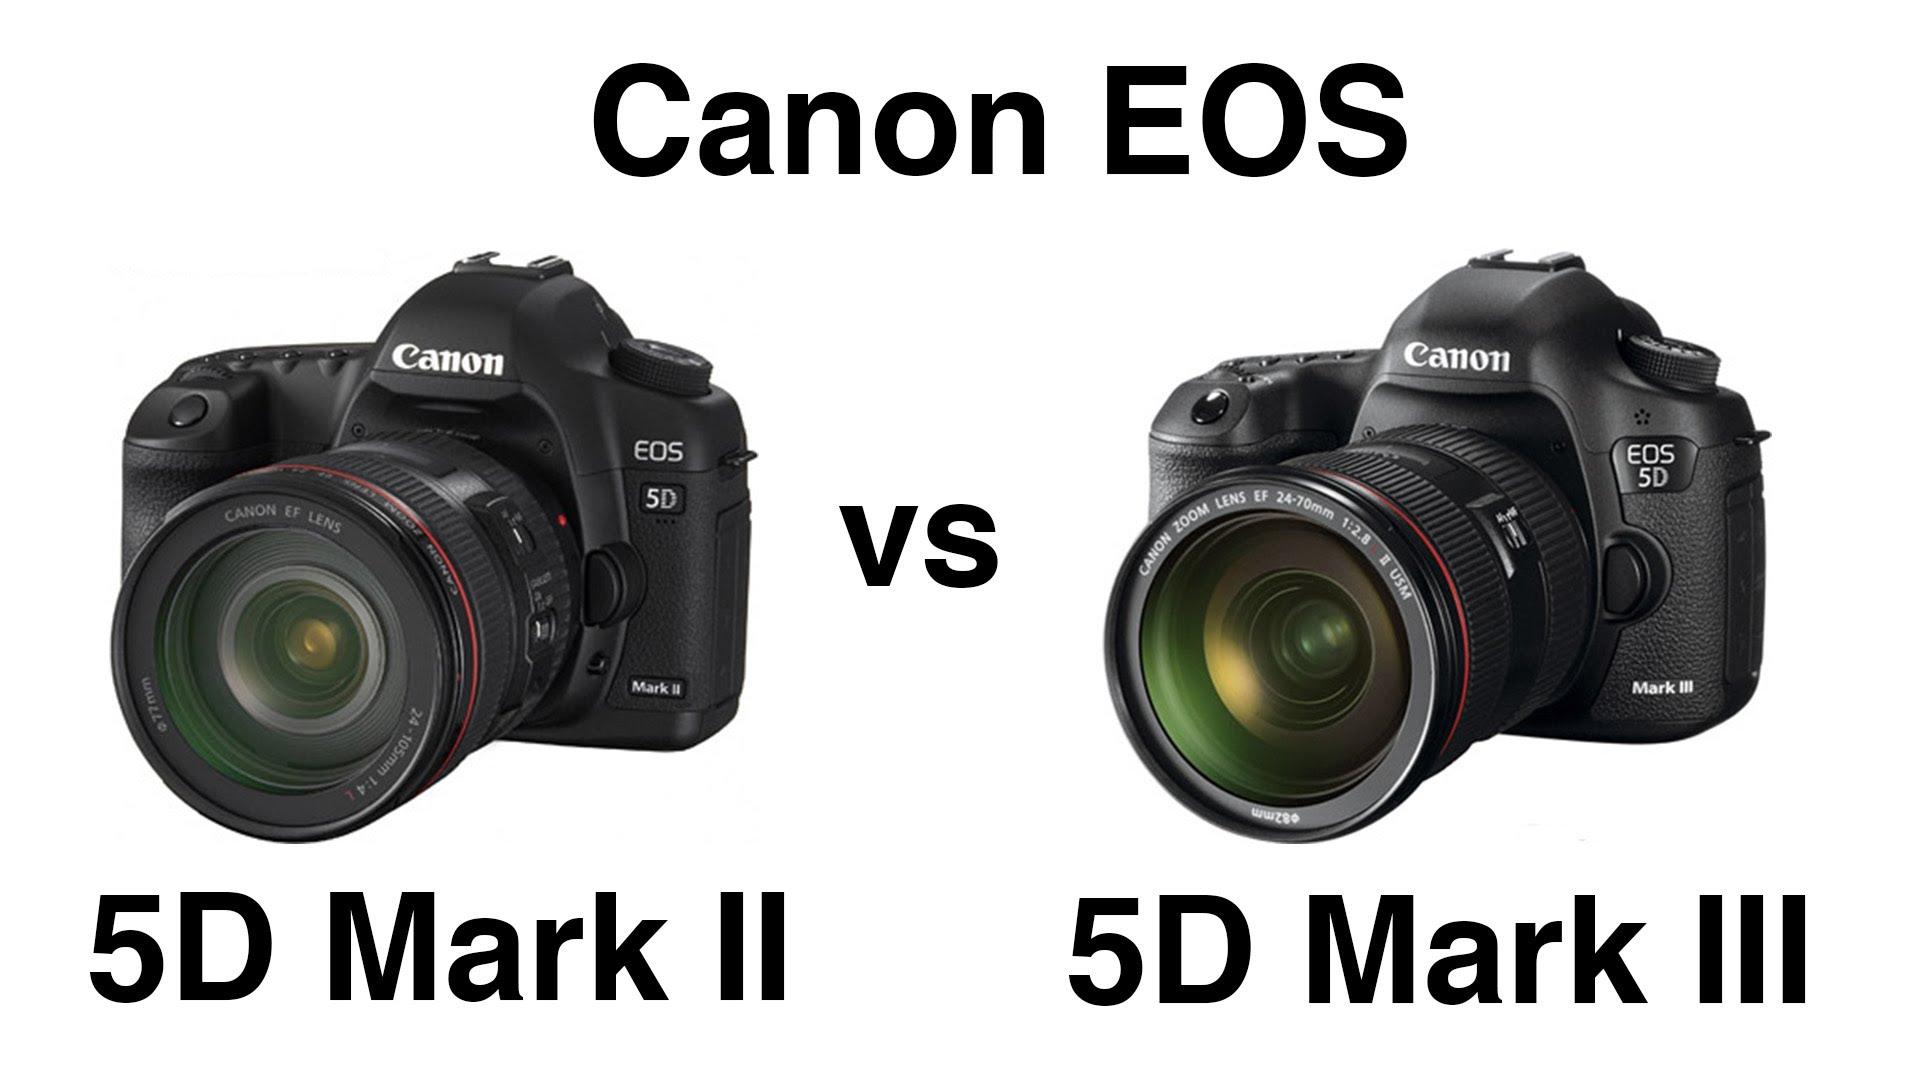 canon 5d mark iii vs 5d mark ii comparison. Black Bedroom Furniture Sets. Home Design Ideas